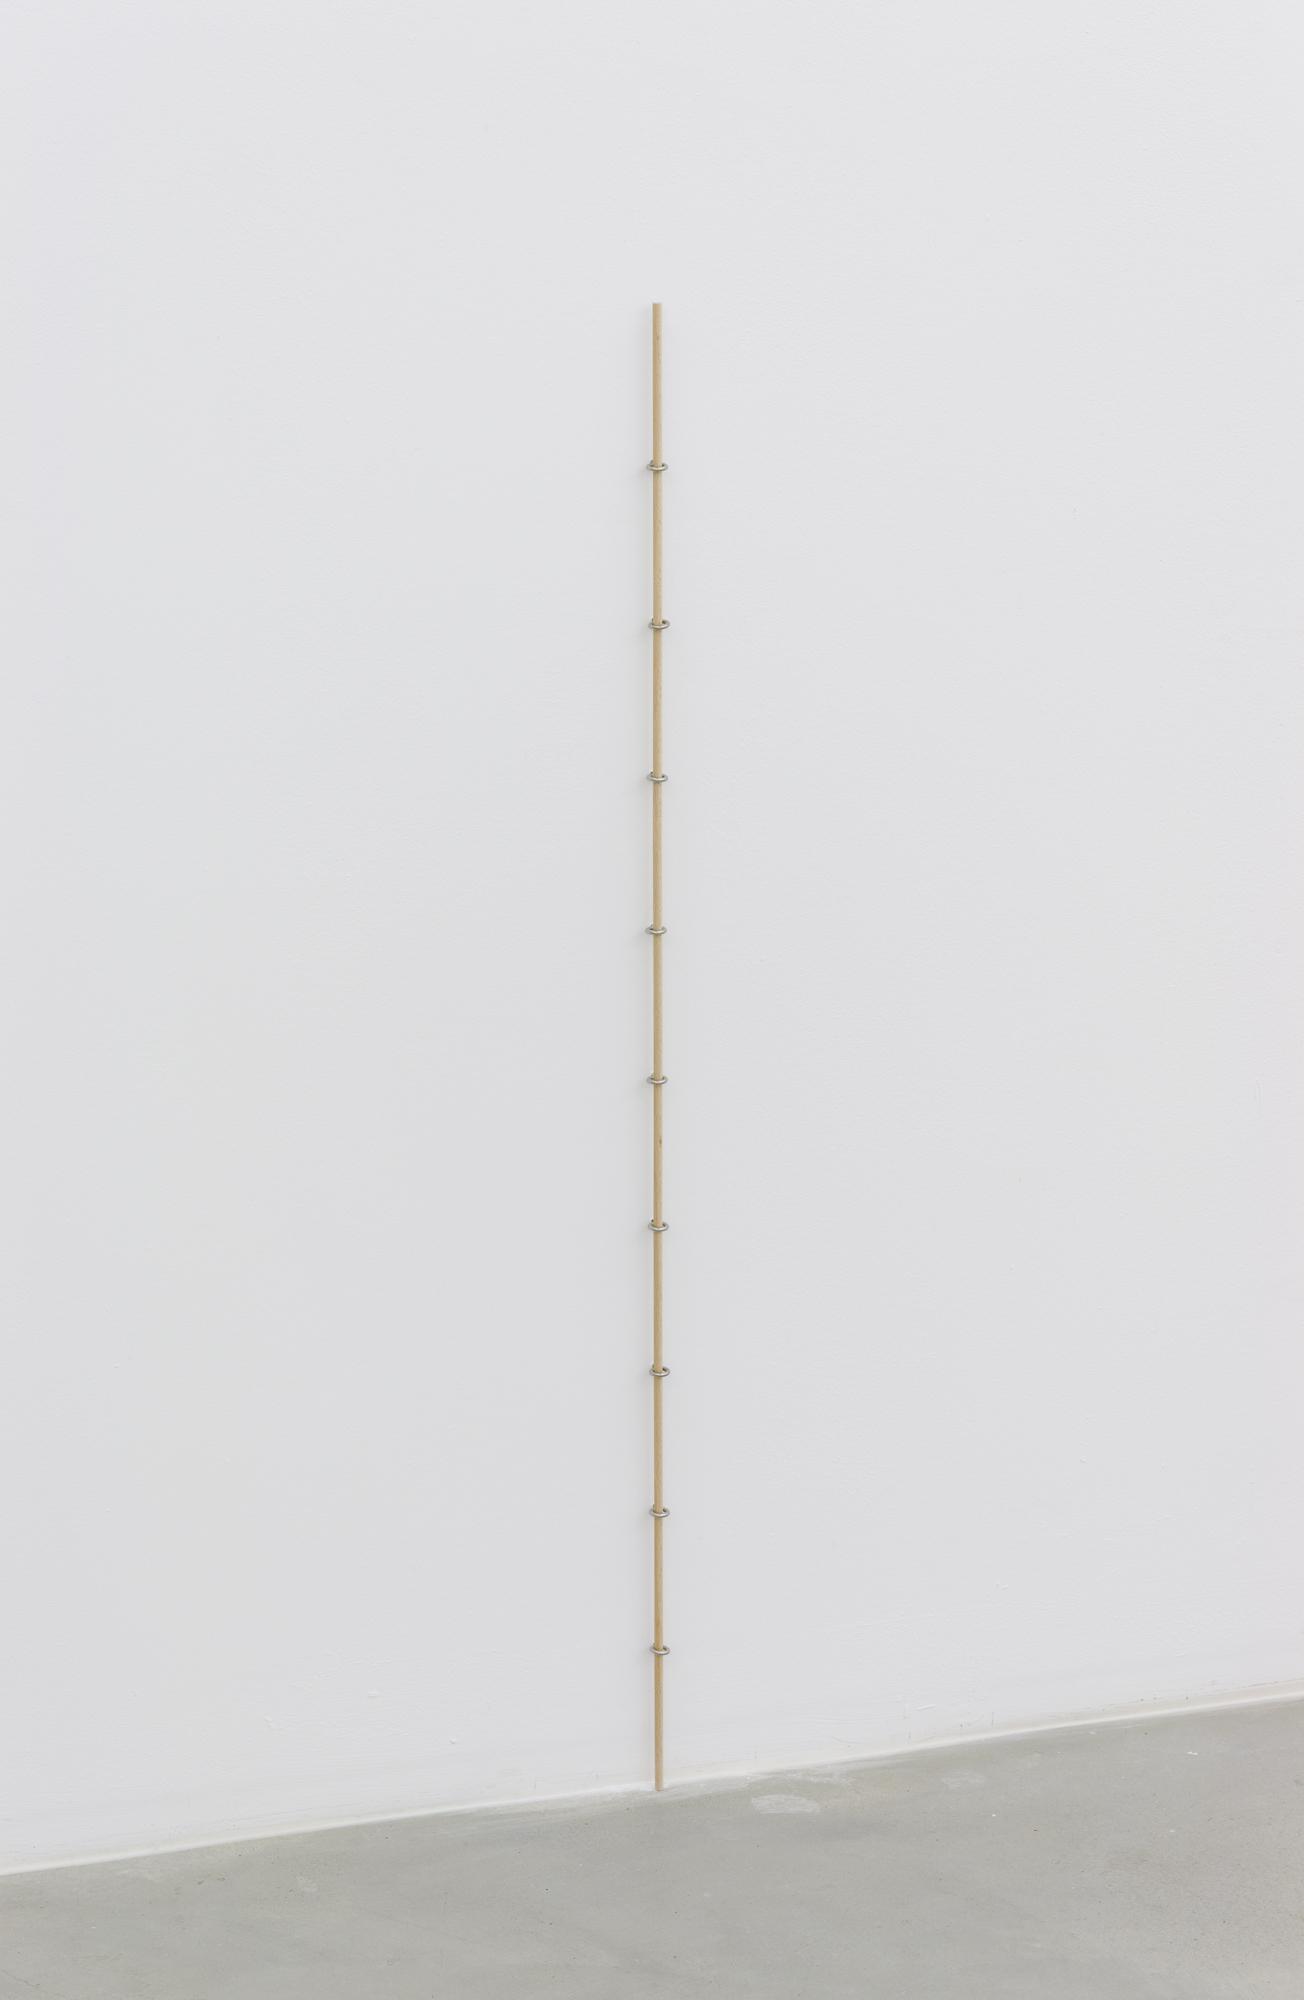 10 cm, wooden rod, screw hooks, 100 cm x 1.5, 2015